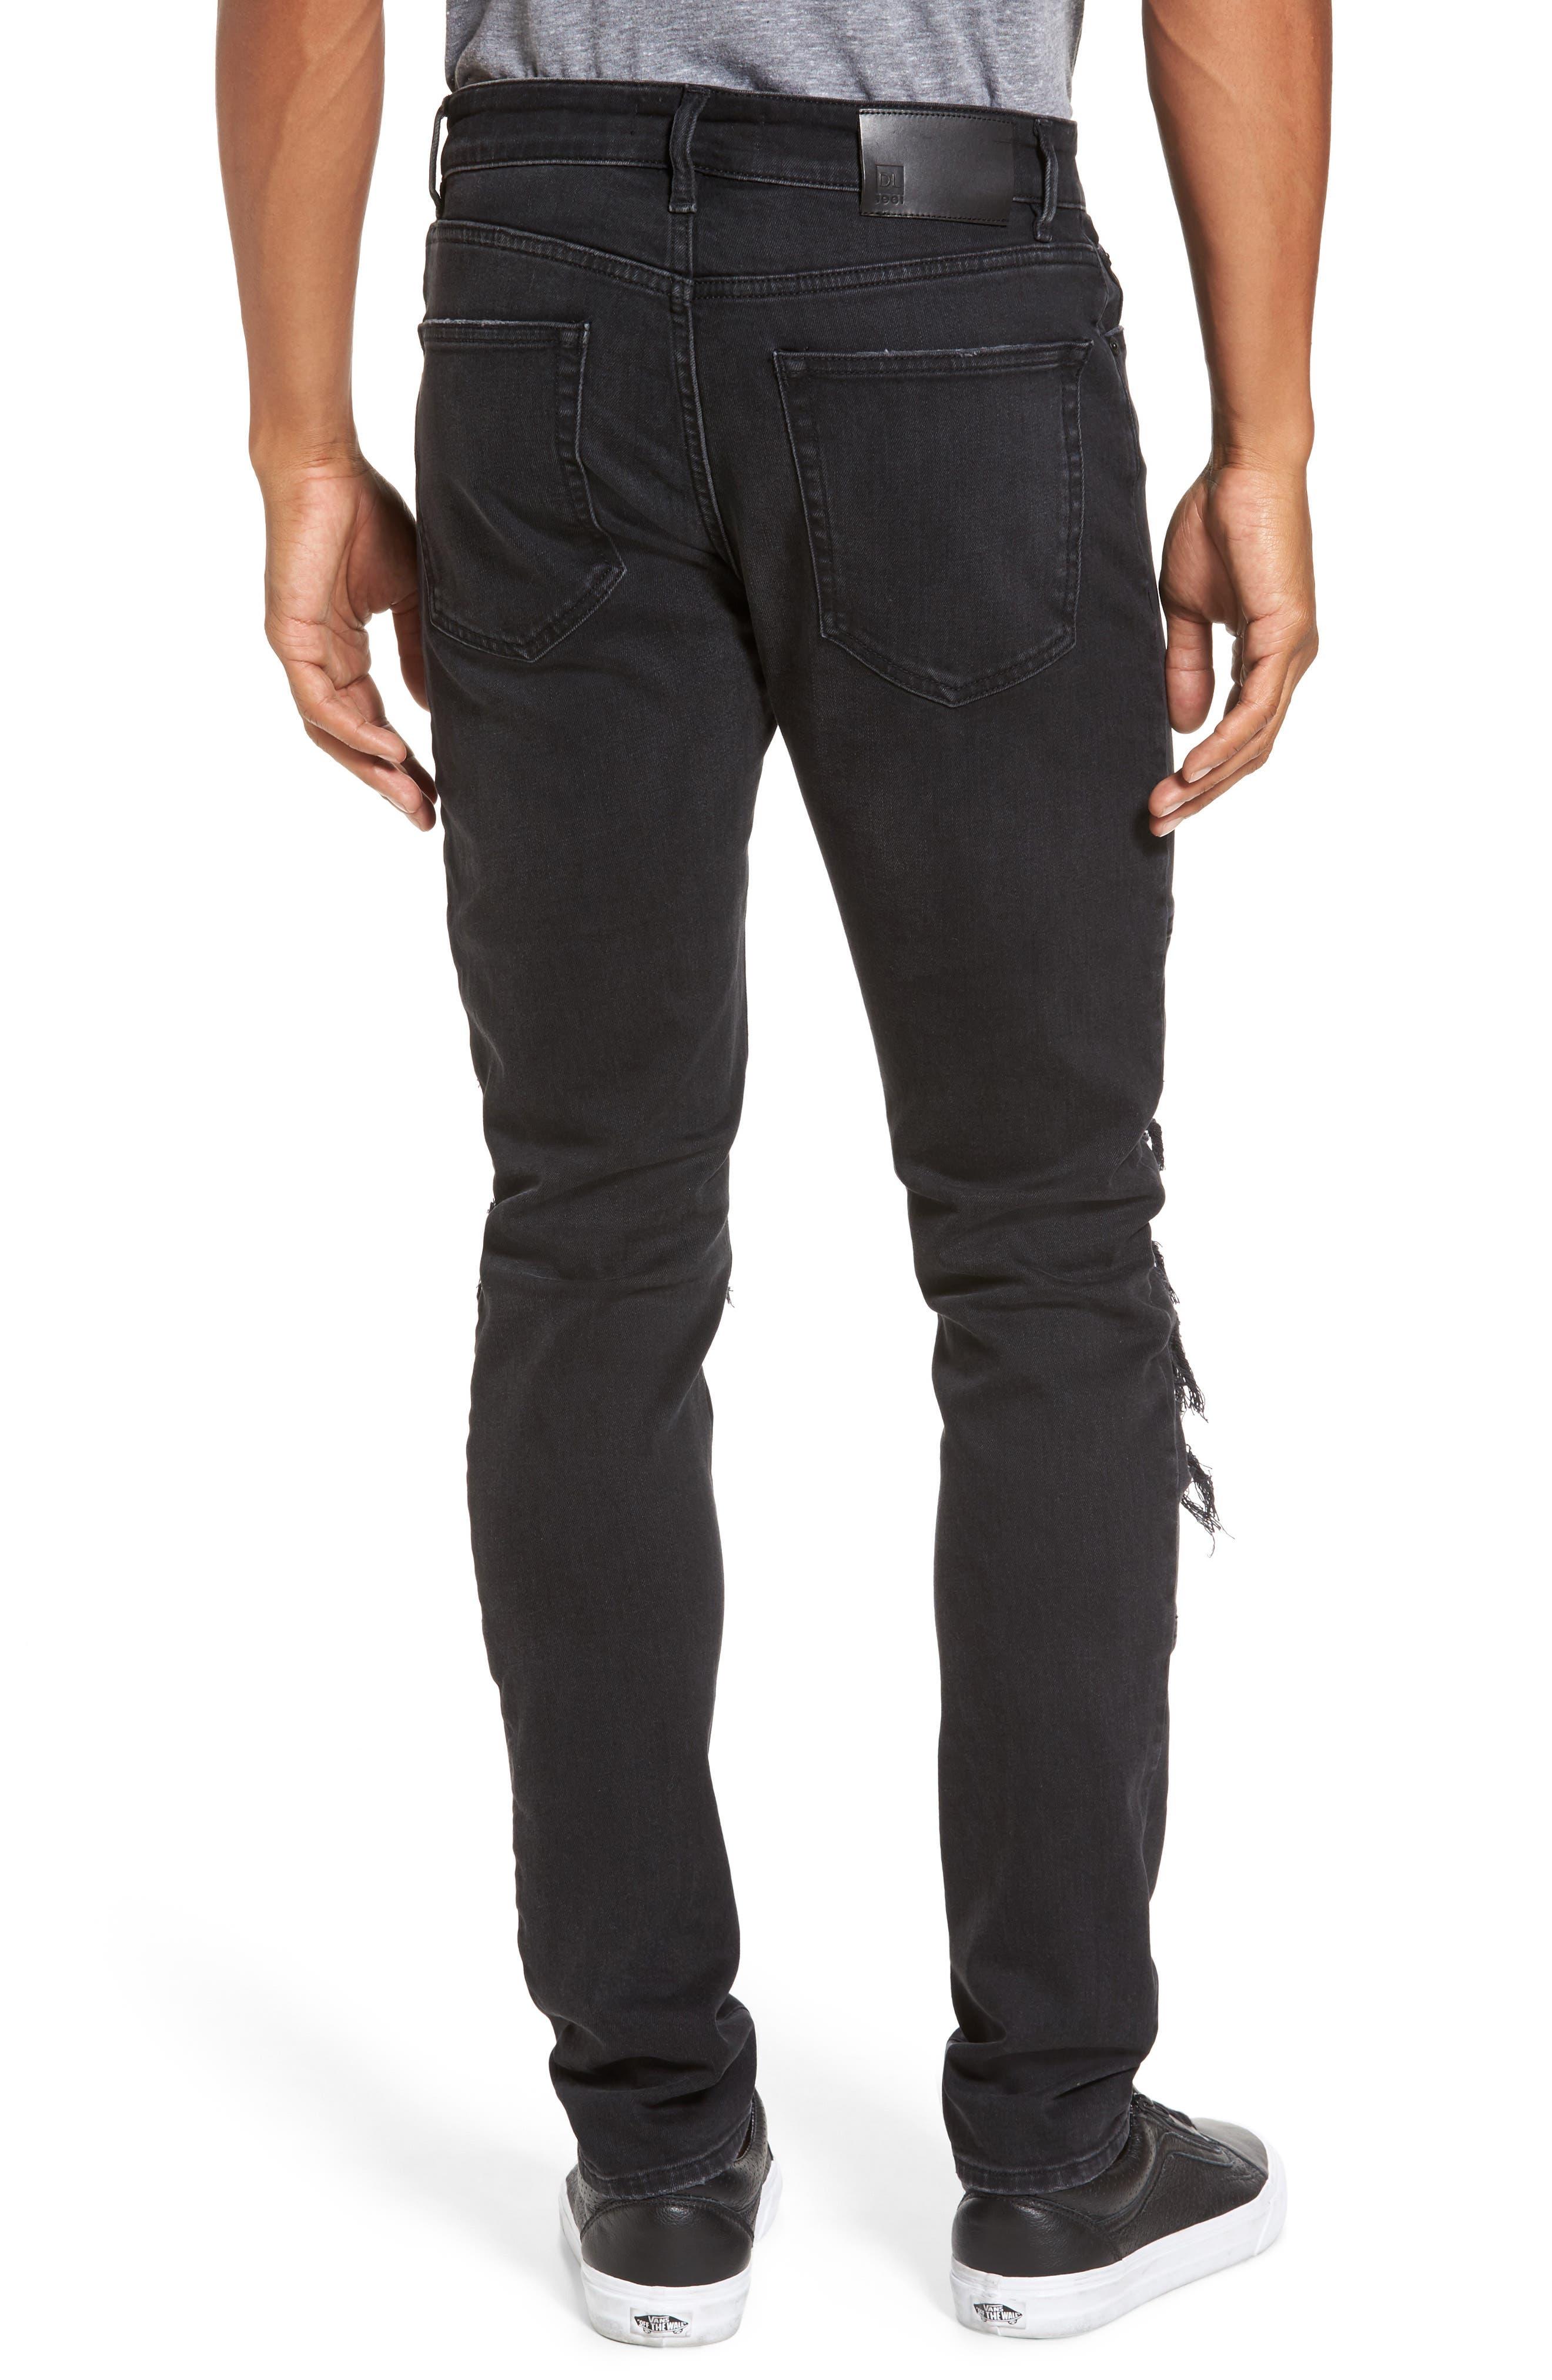 Hunter Skinny Jeans,                             Alternate thumbnail 2, color,                             001